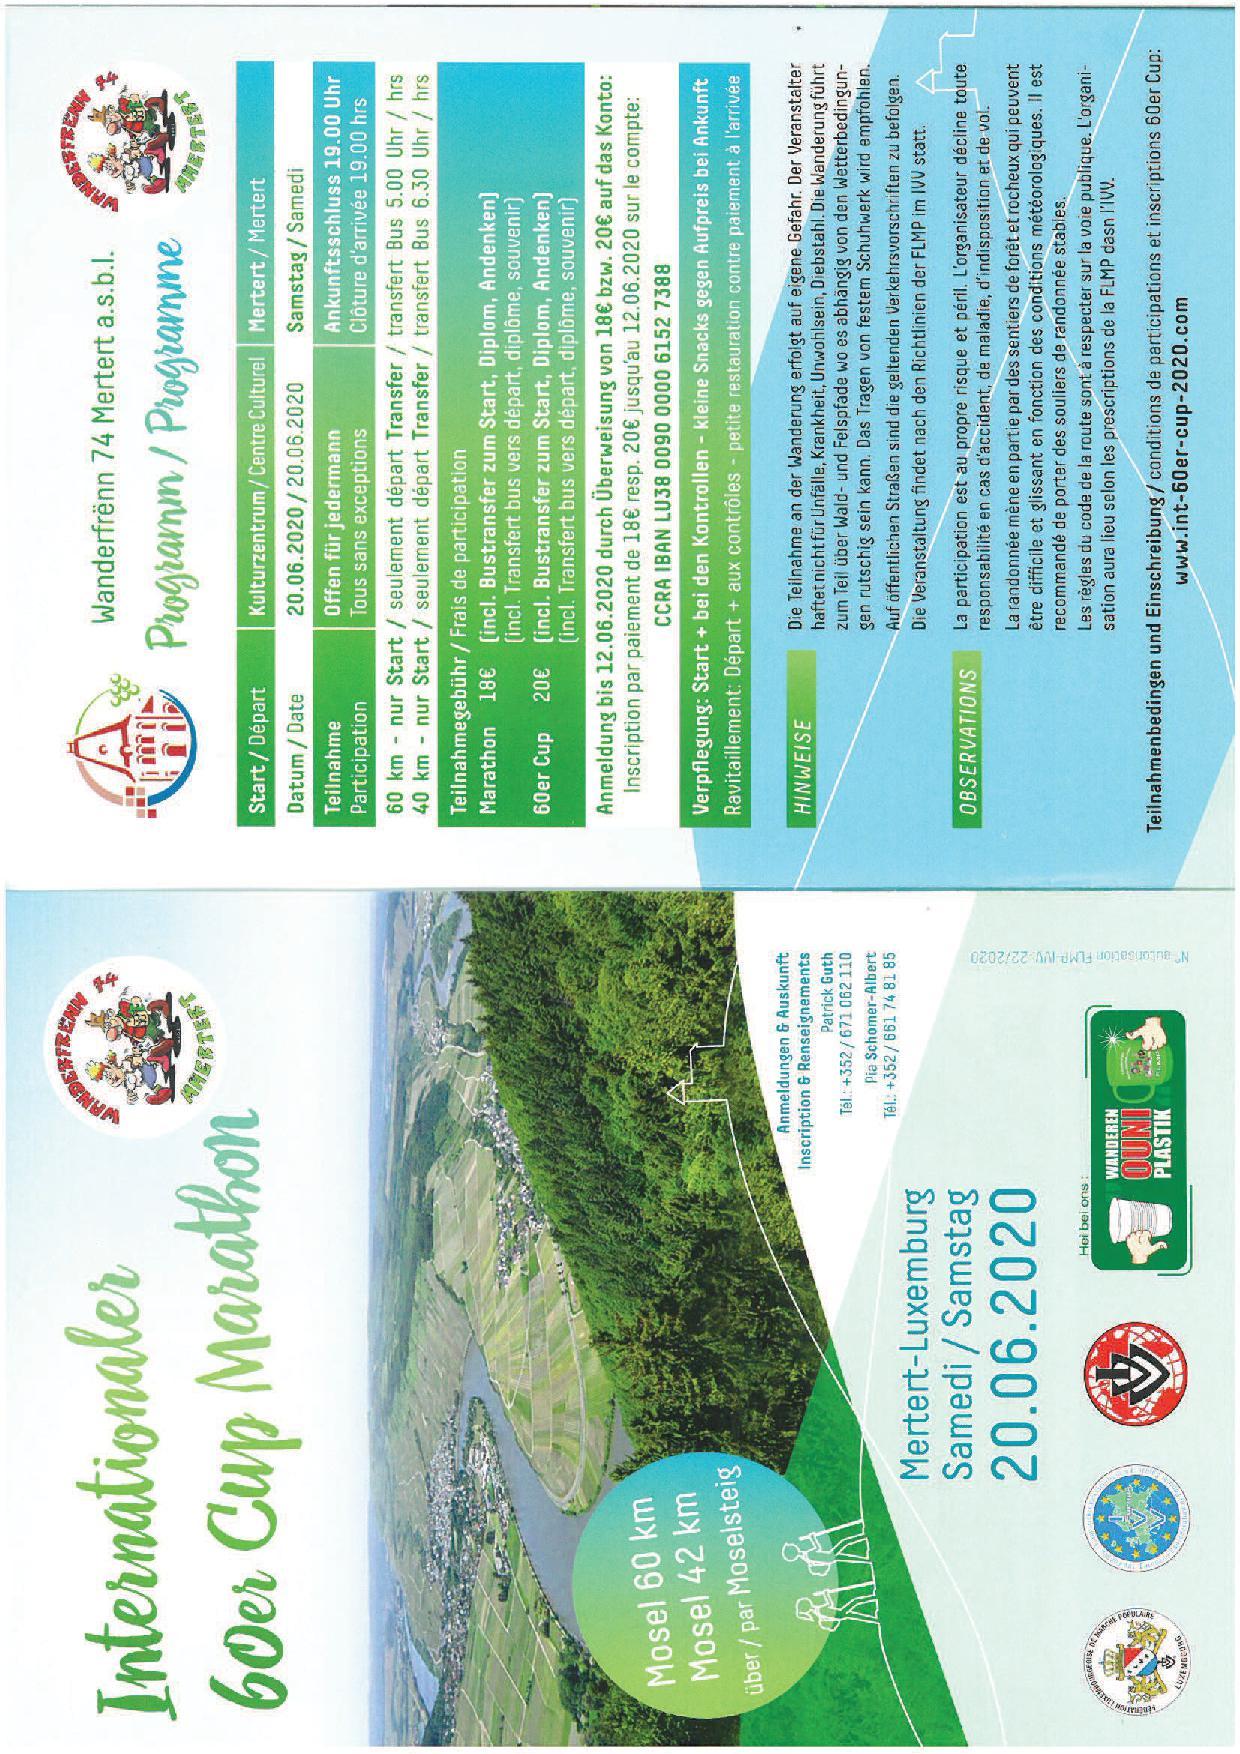 ANNULATION ABSAGE MERTERT FLMP IVV 60er Cup Marathon